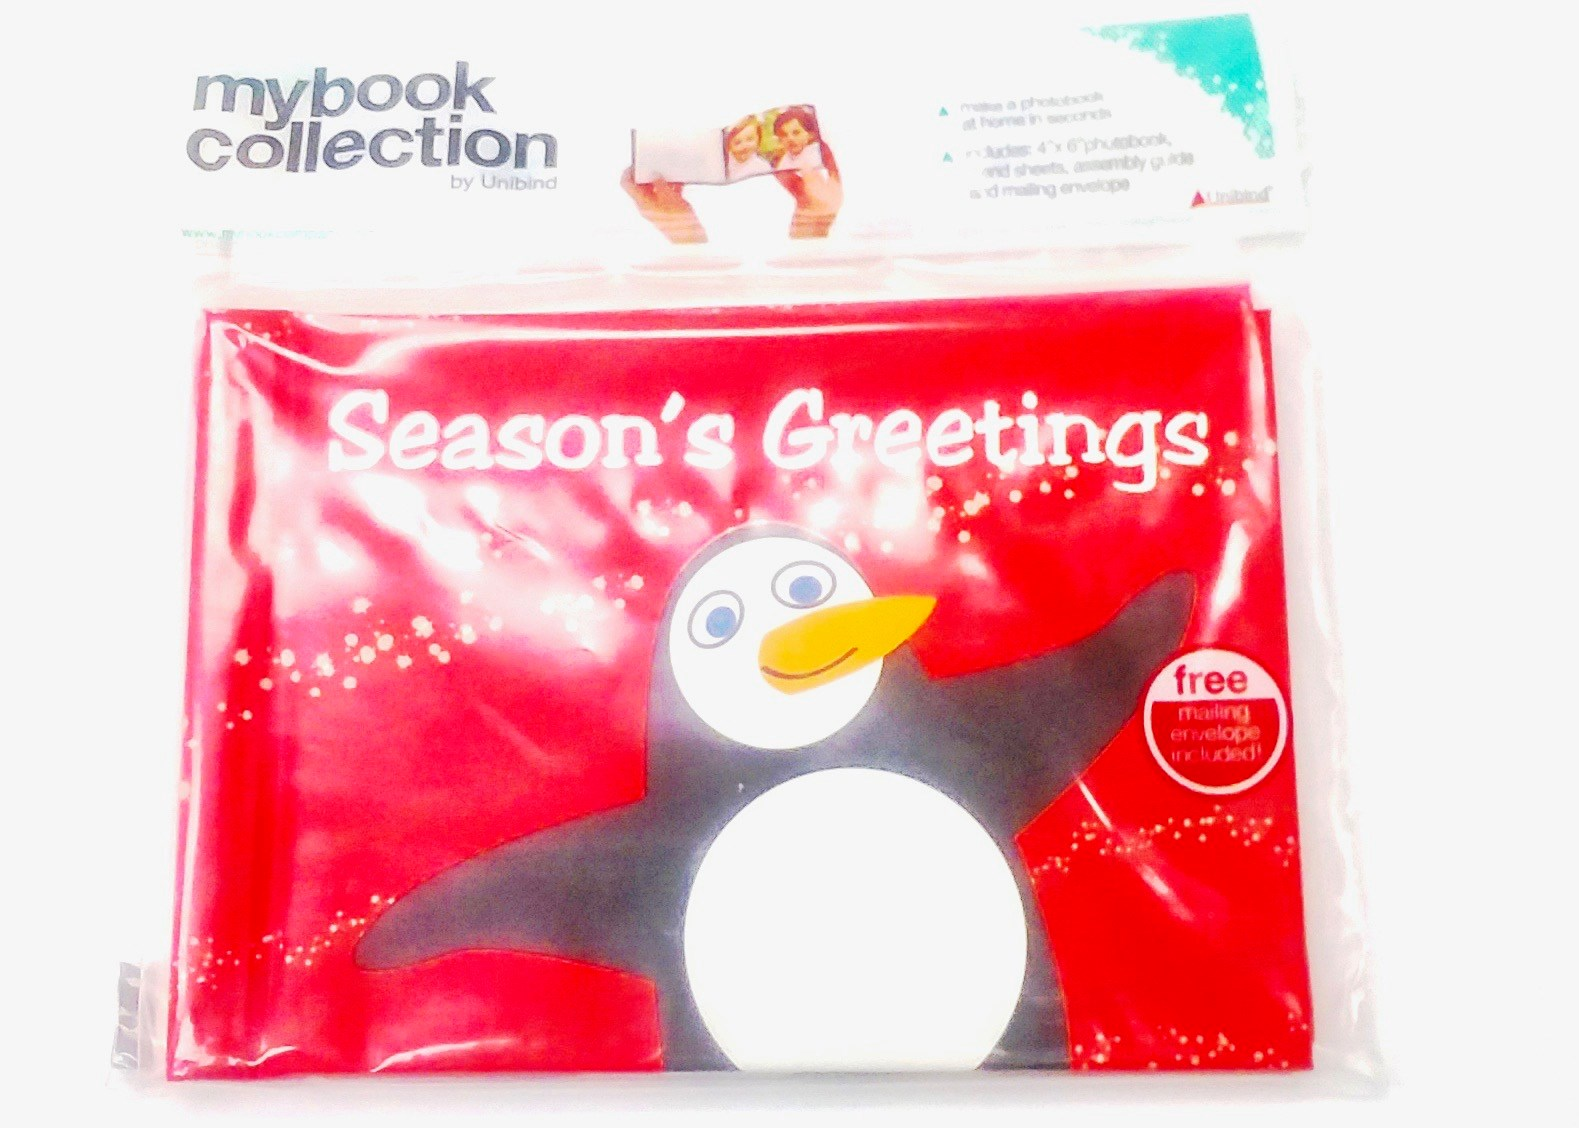 Photobook Mailer - Season's Greetings Penguins